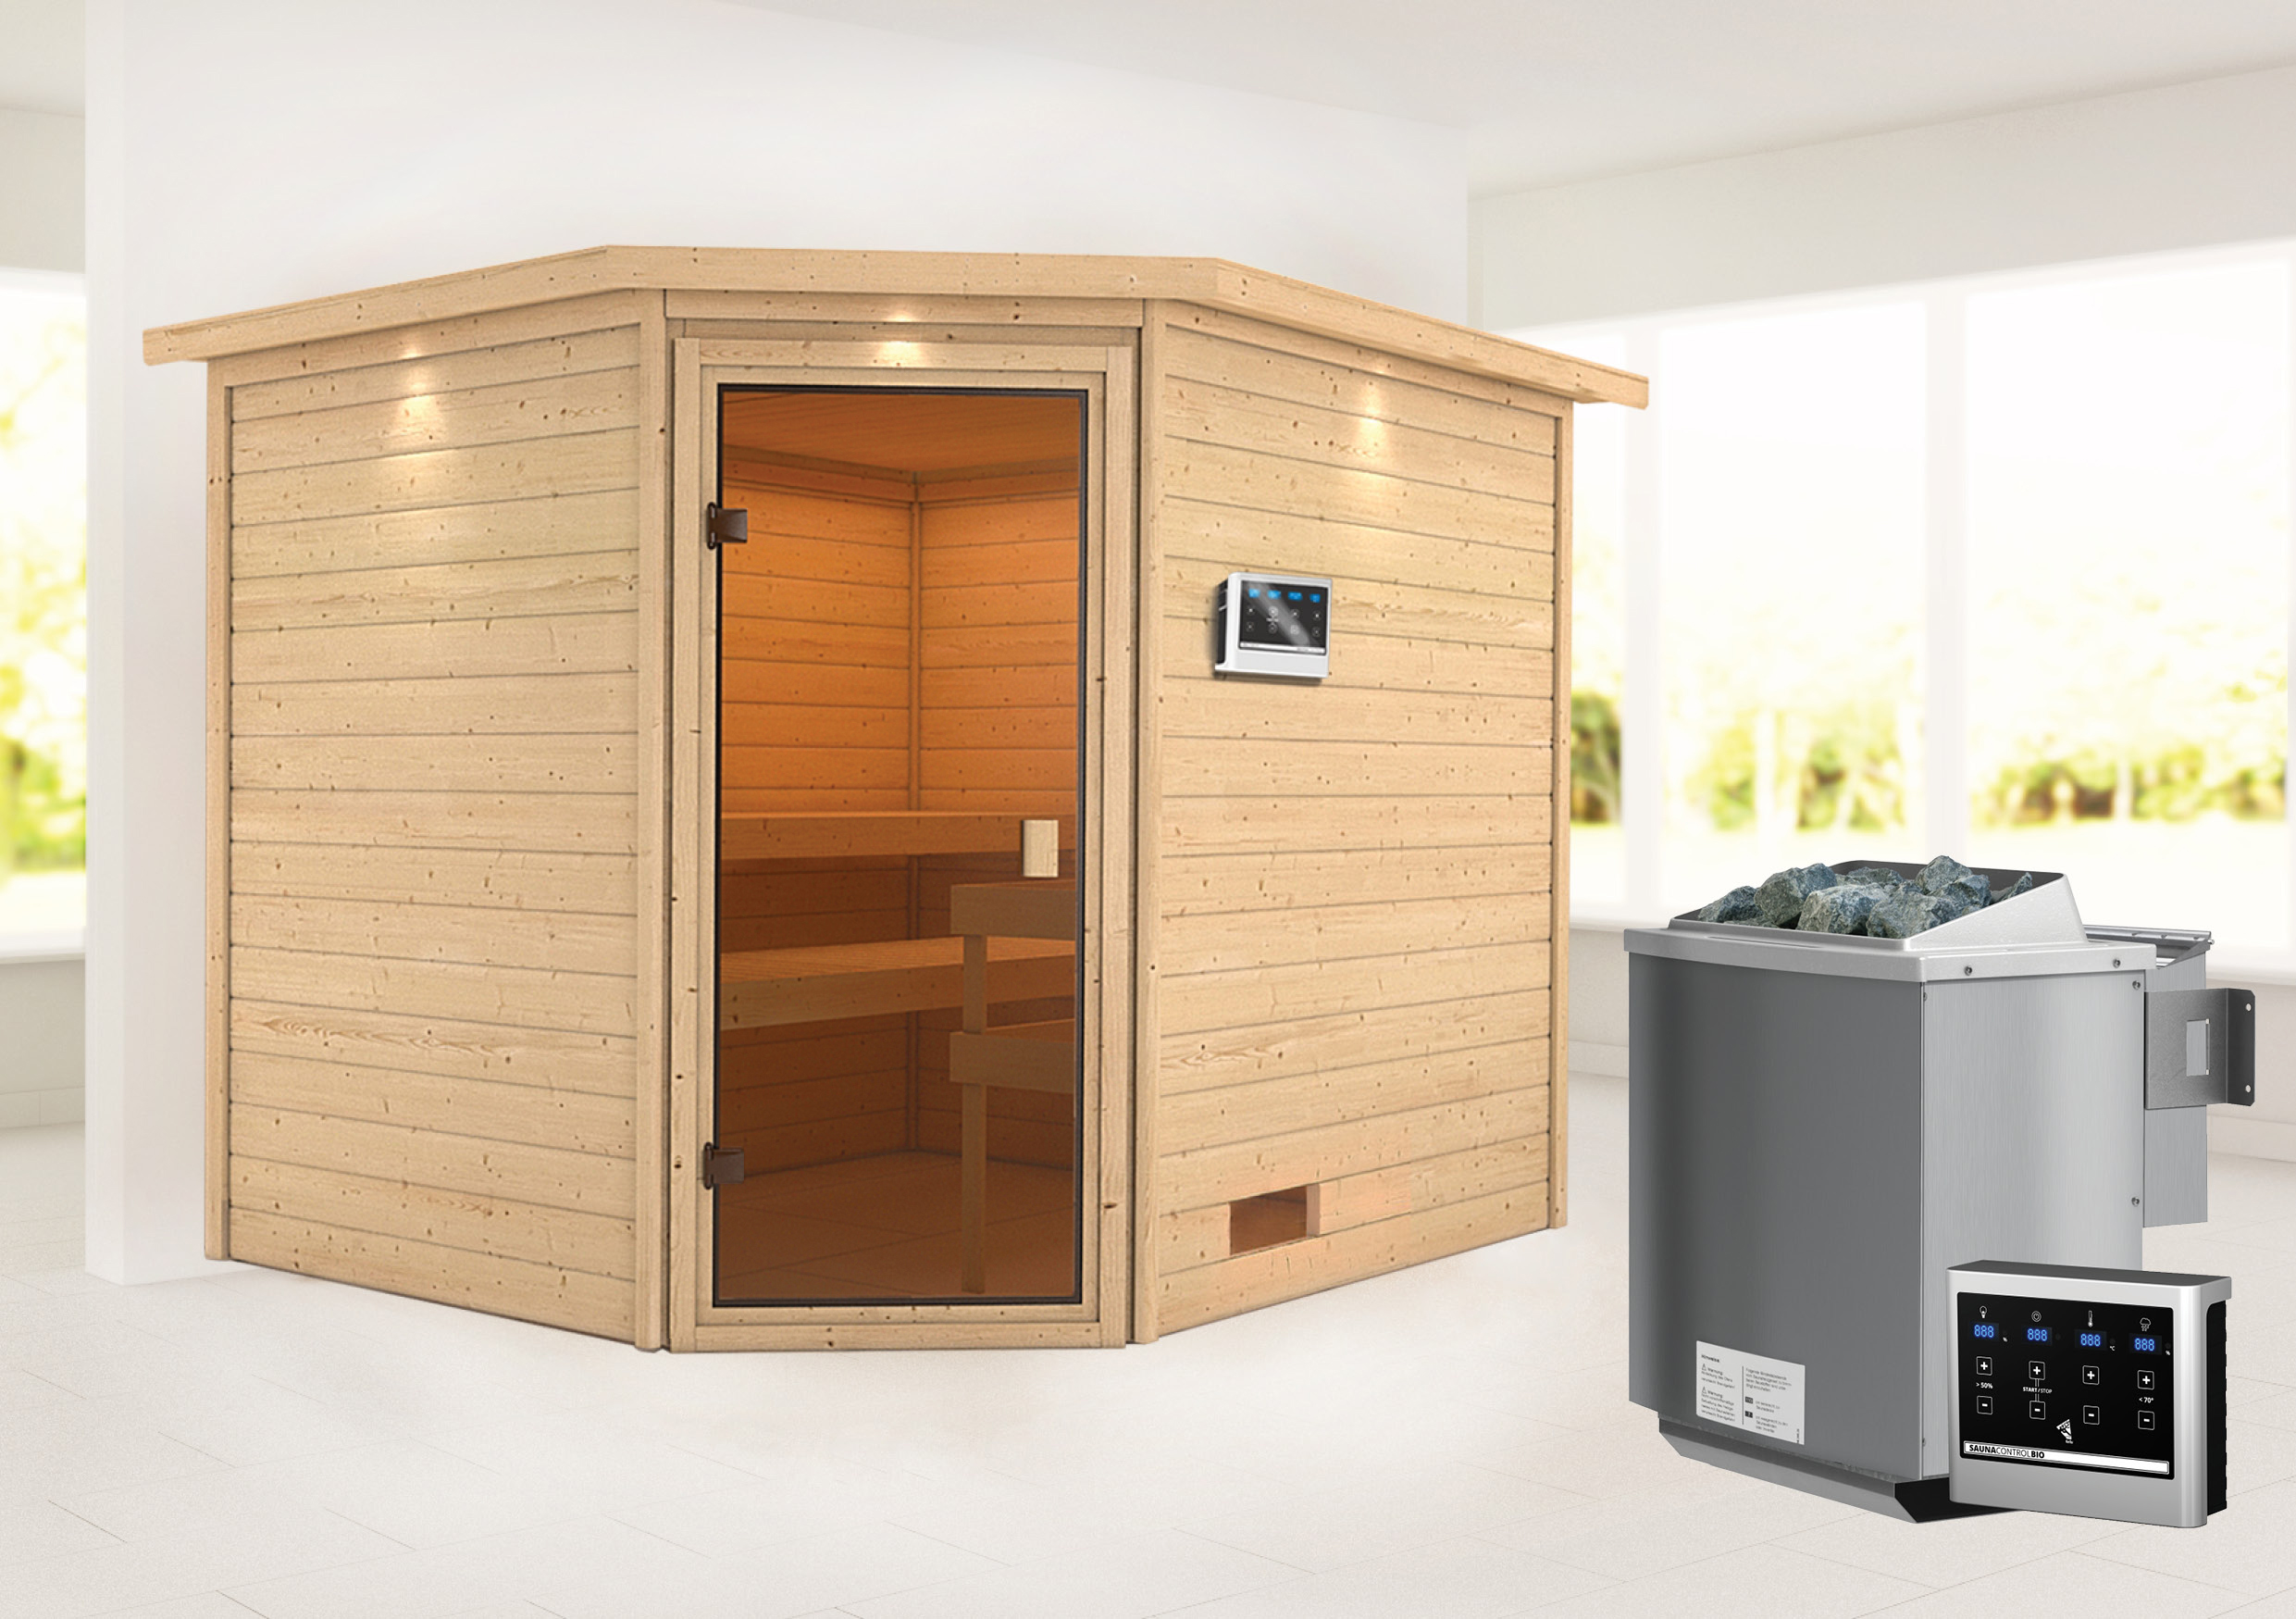 Woodfeeling Sauna Lotta 38mm Dachkranz Bio Saunaofen 9 kW extern Bild 1